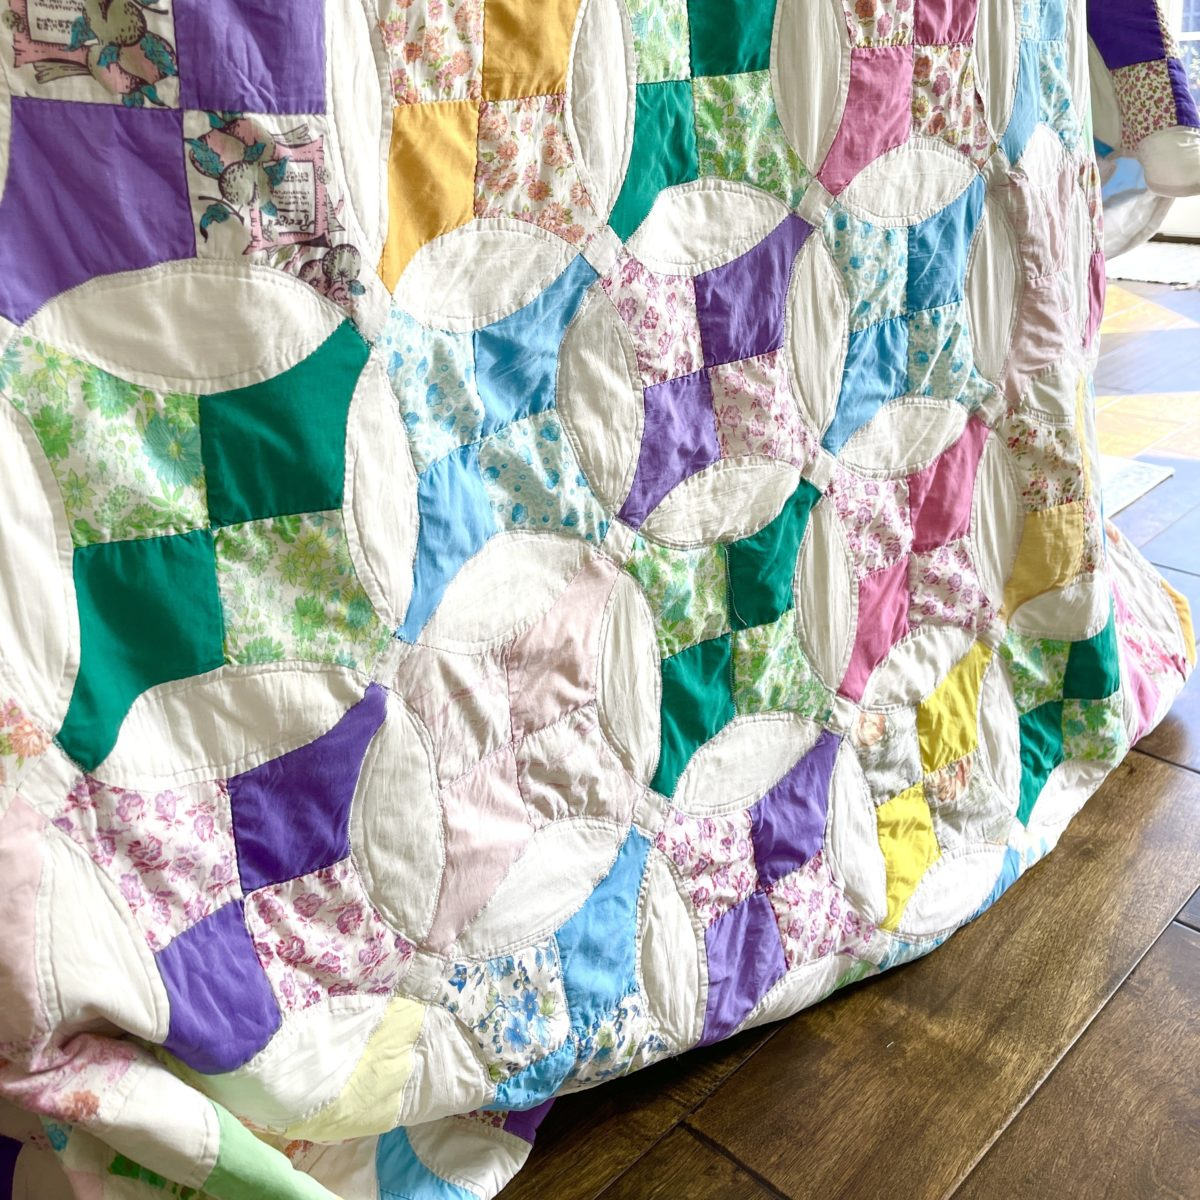 Storing Vintage Quilts